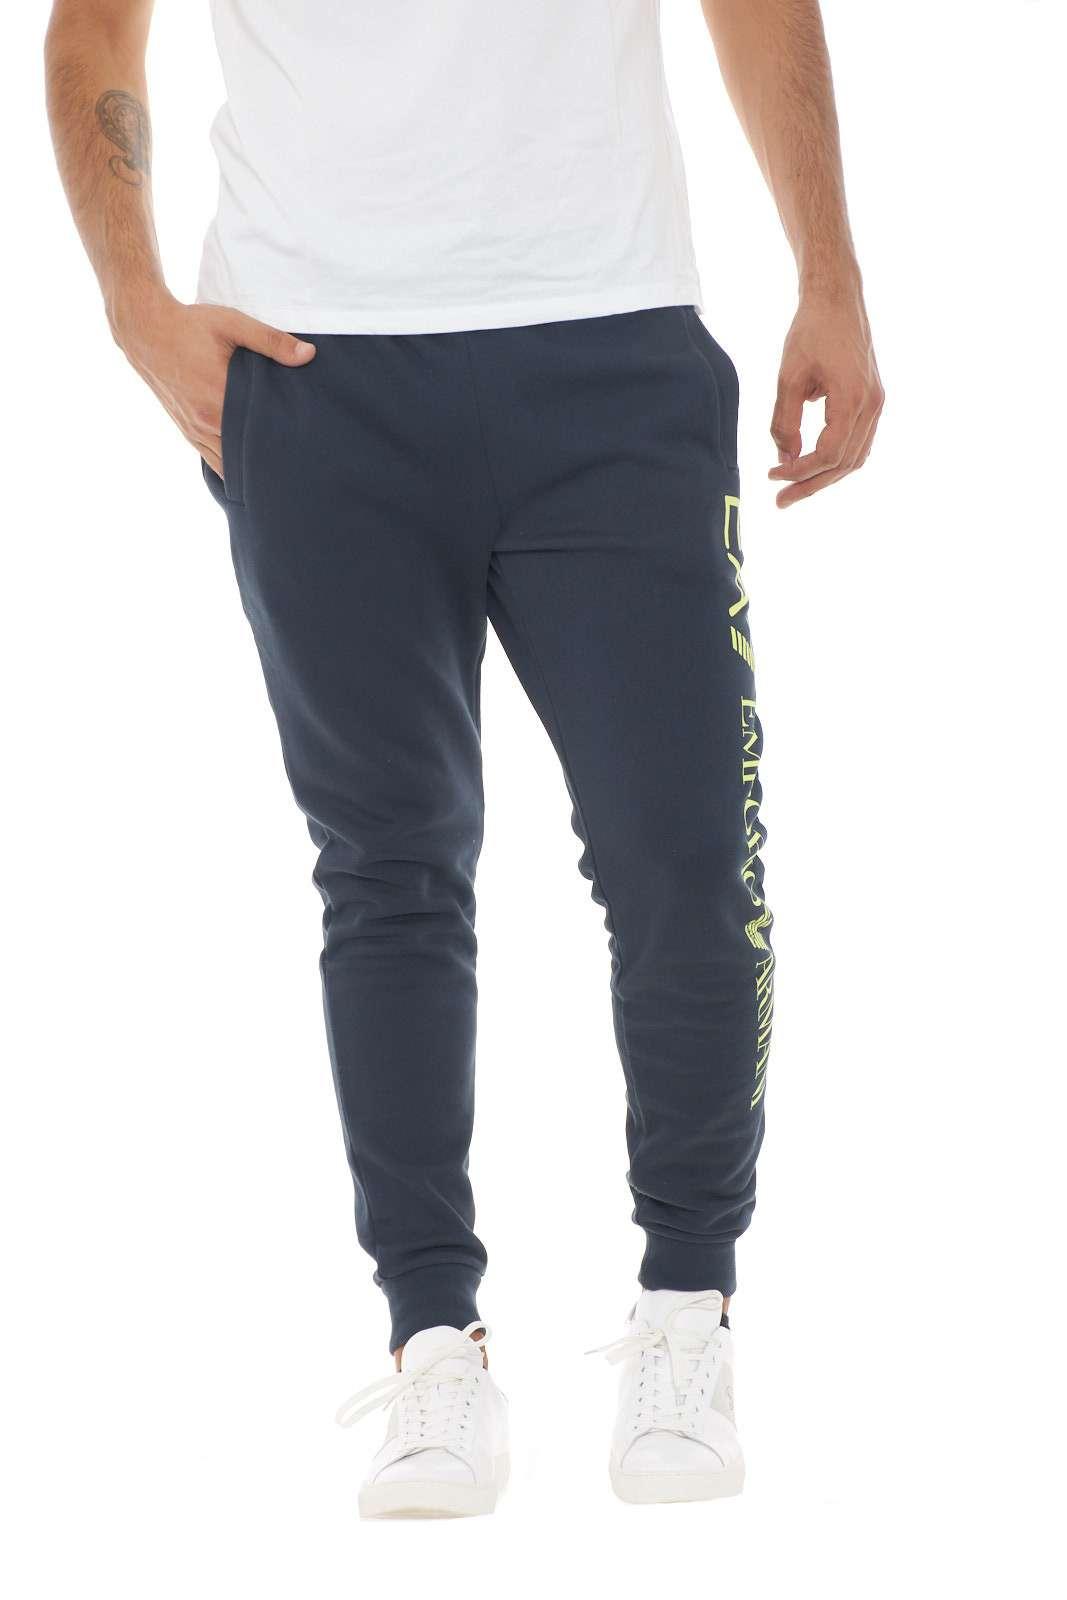 https://www.parmax.com/media/catalog/product/a/i/AI-outlet_parmax-pantaloni-uomo-Emporio-Armani-8NPPB5-A.jpg